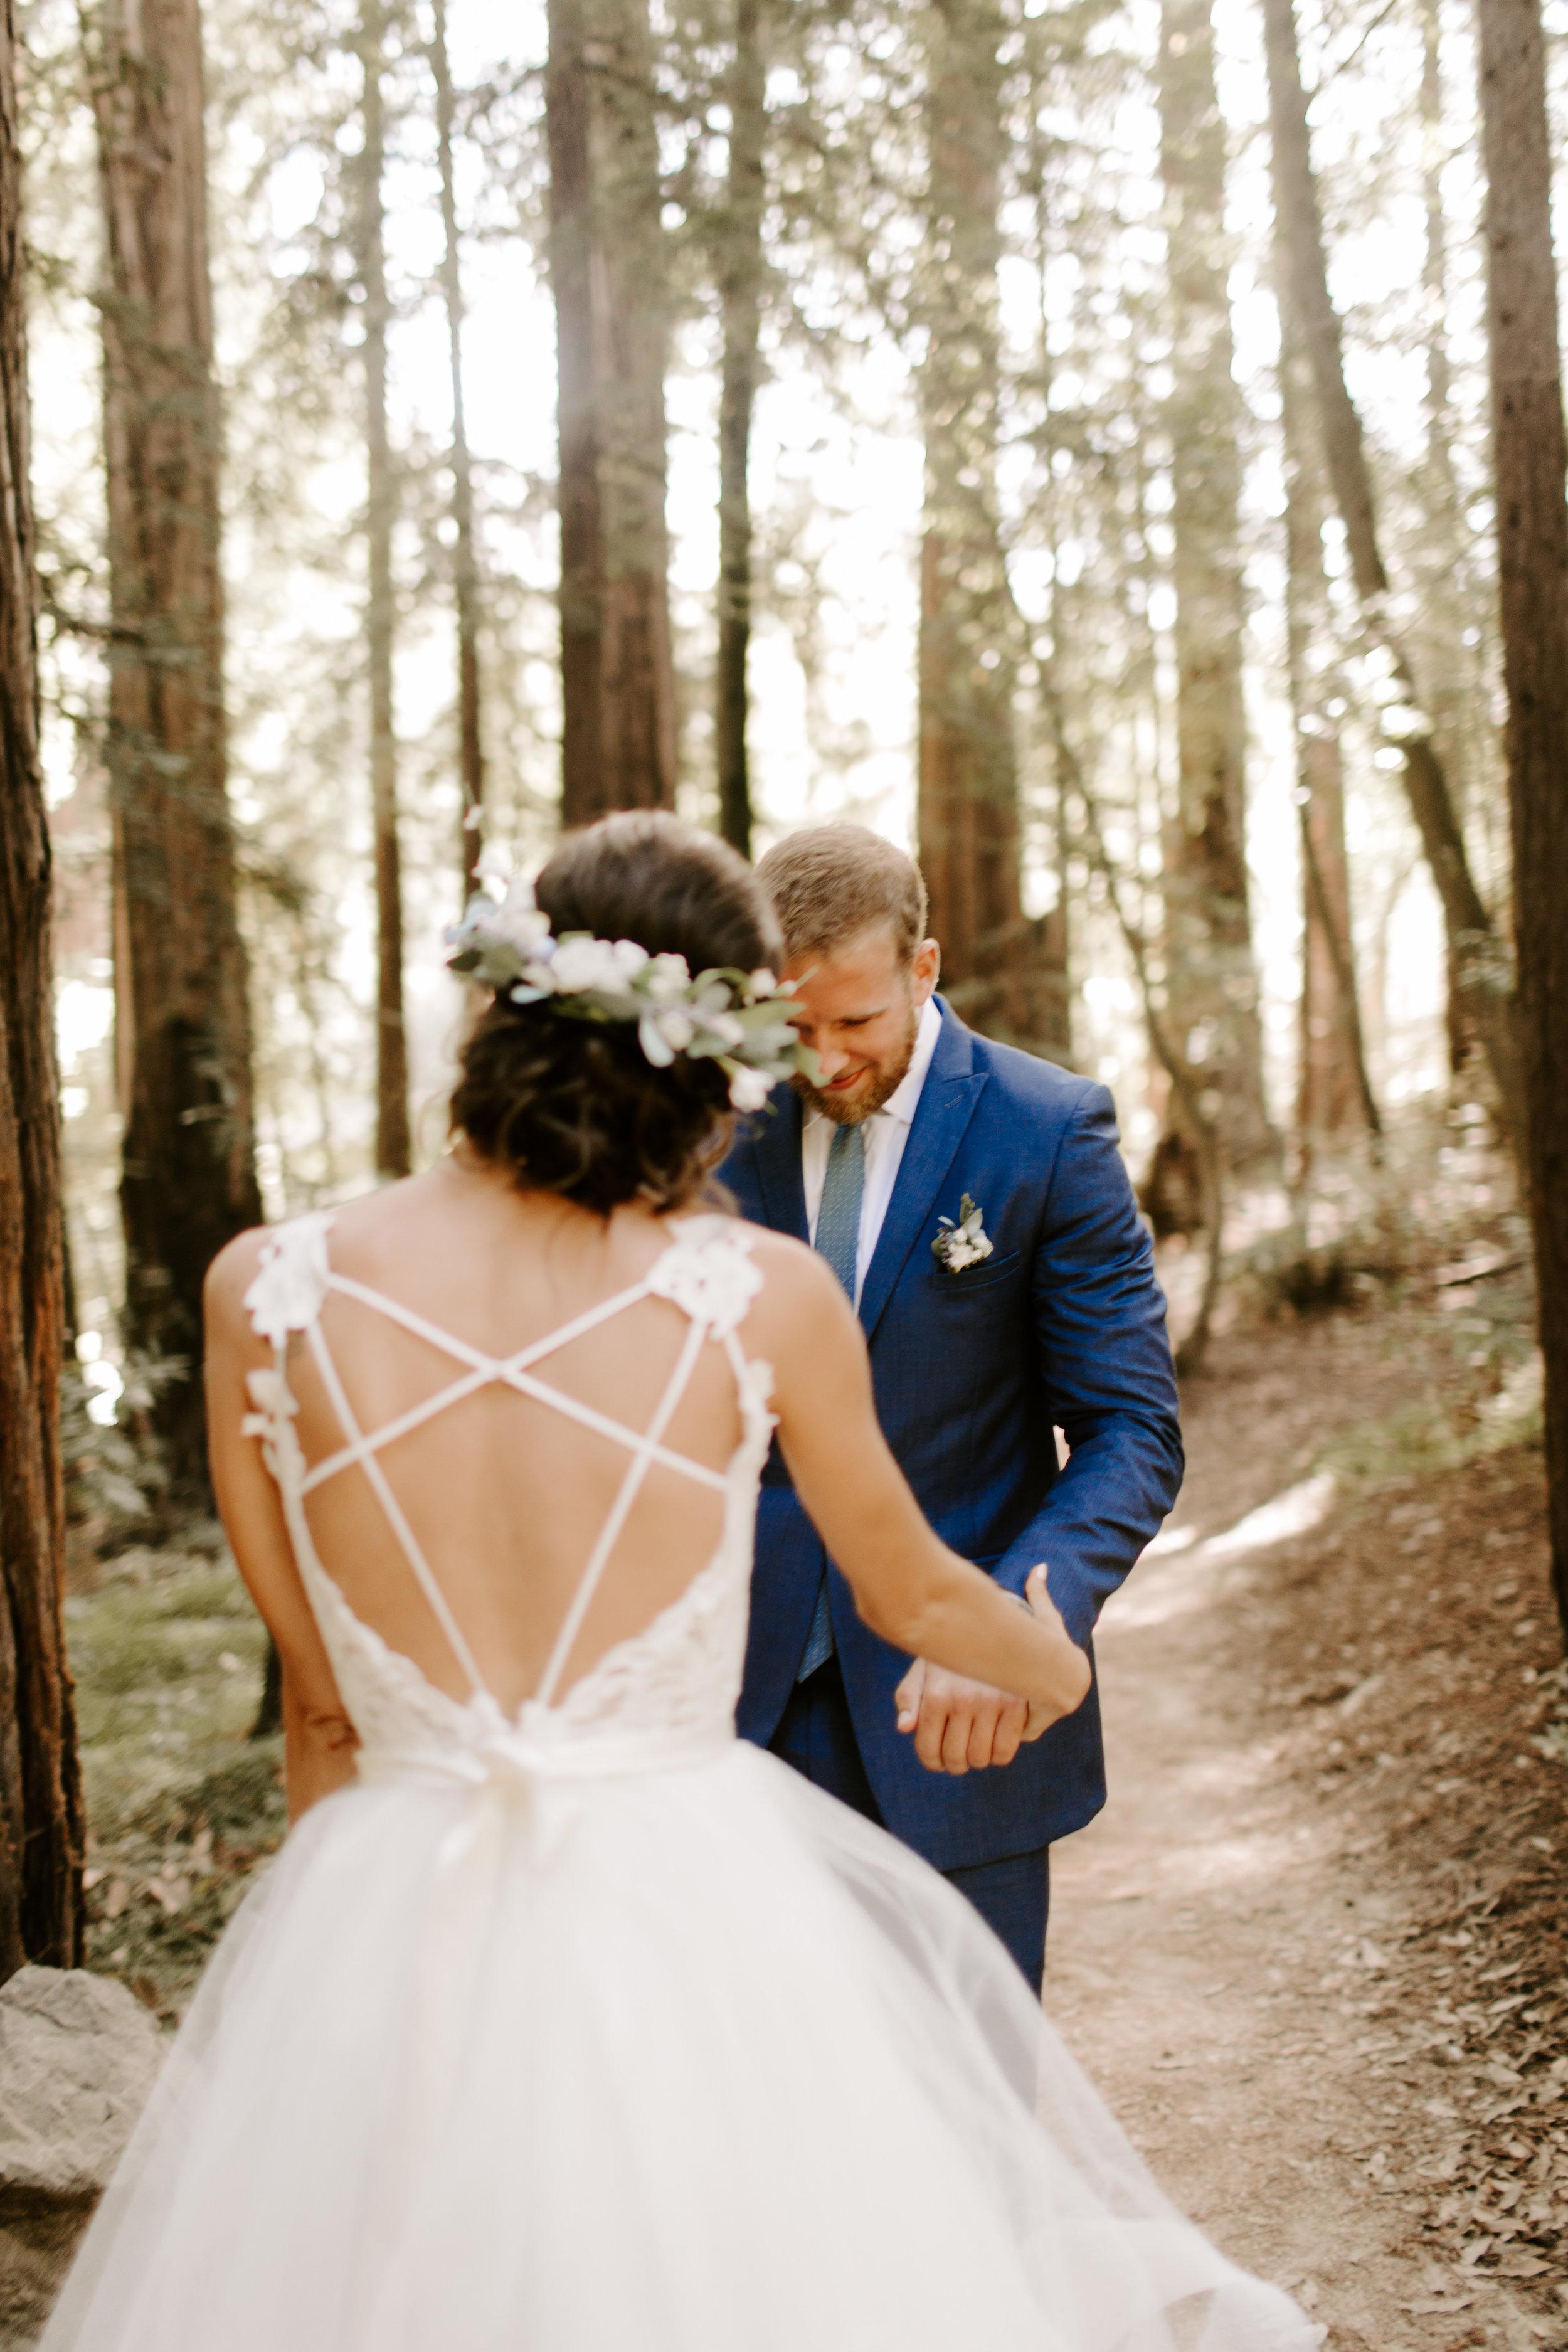 pheiffer beach big sur california wedding first look-1-7.jpg